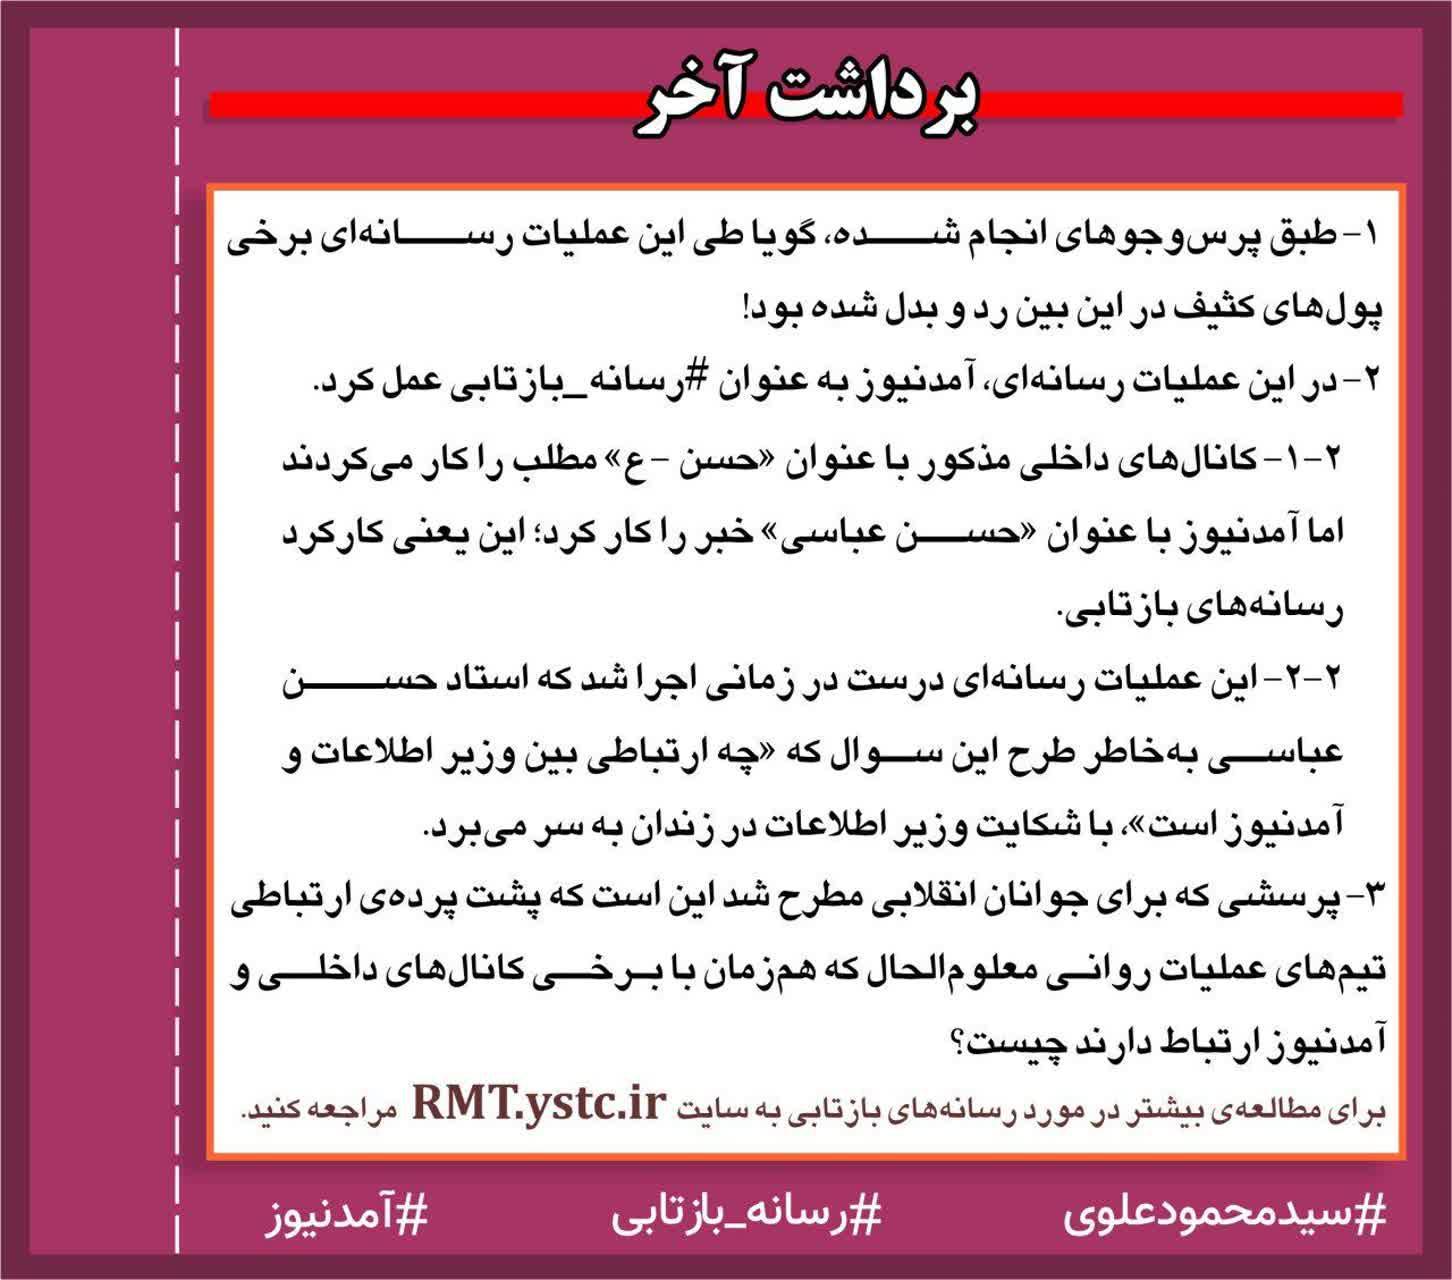 http://dl-abbasi.ir/yekta/1398/Graphic/RMT/6.jpg